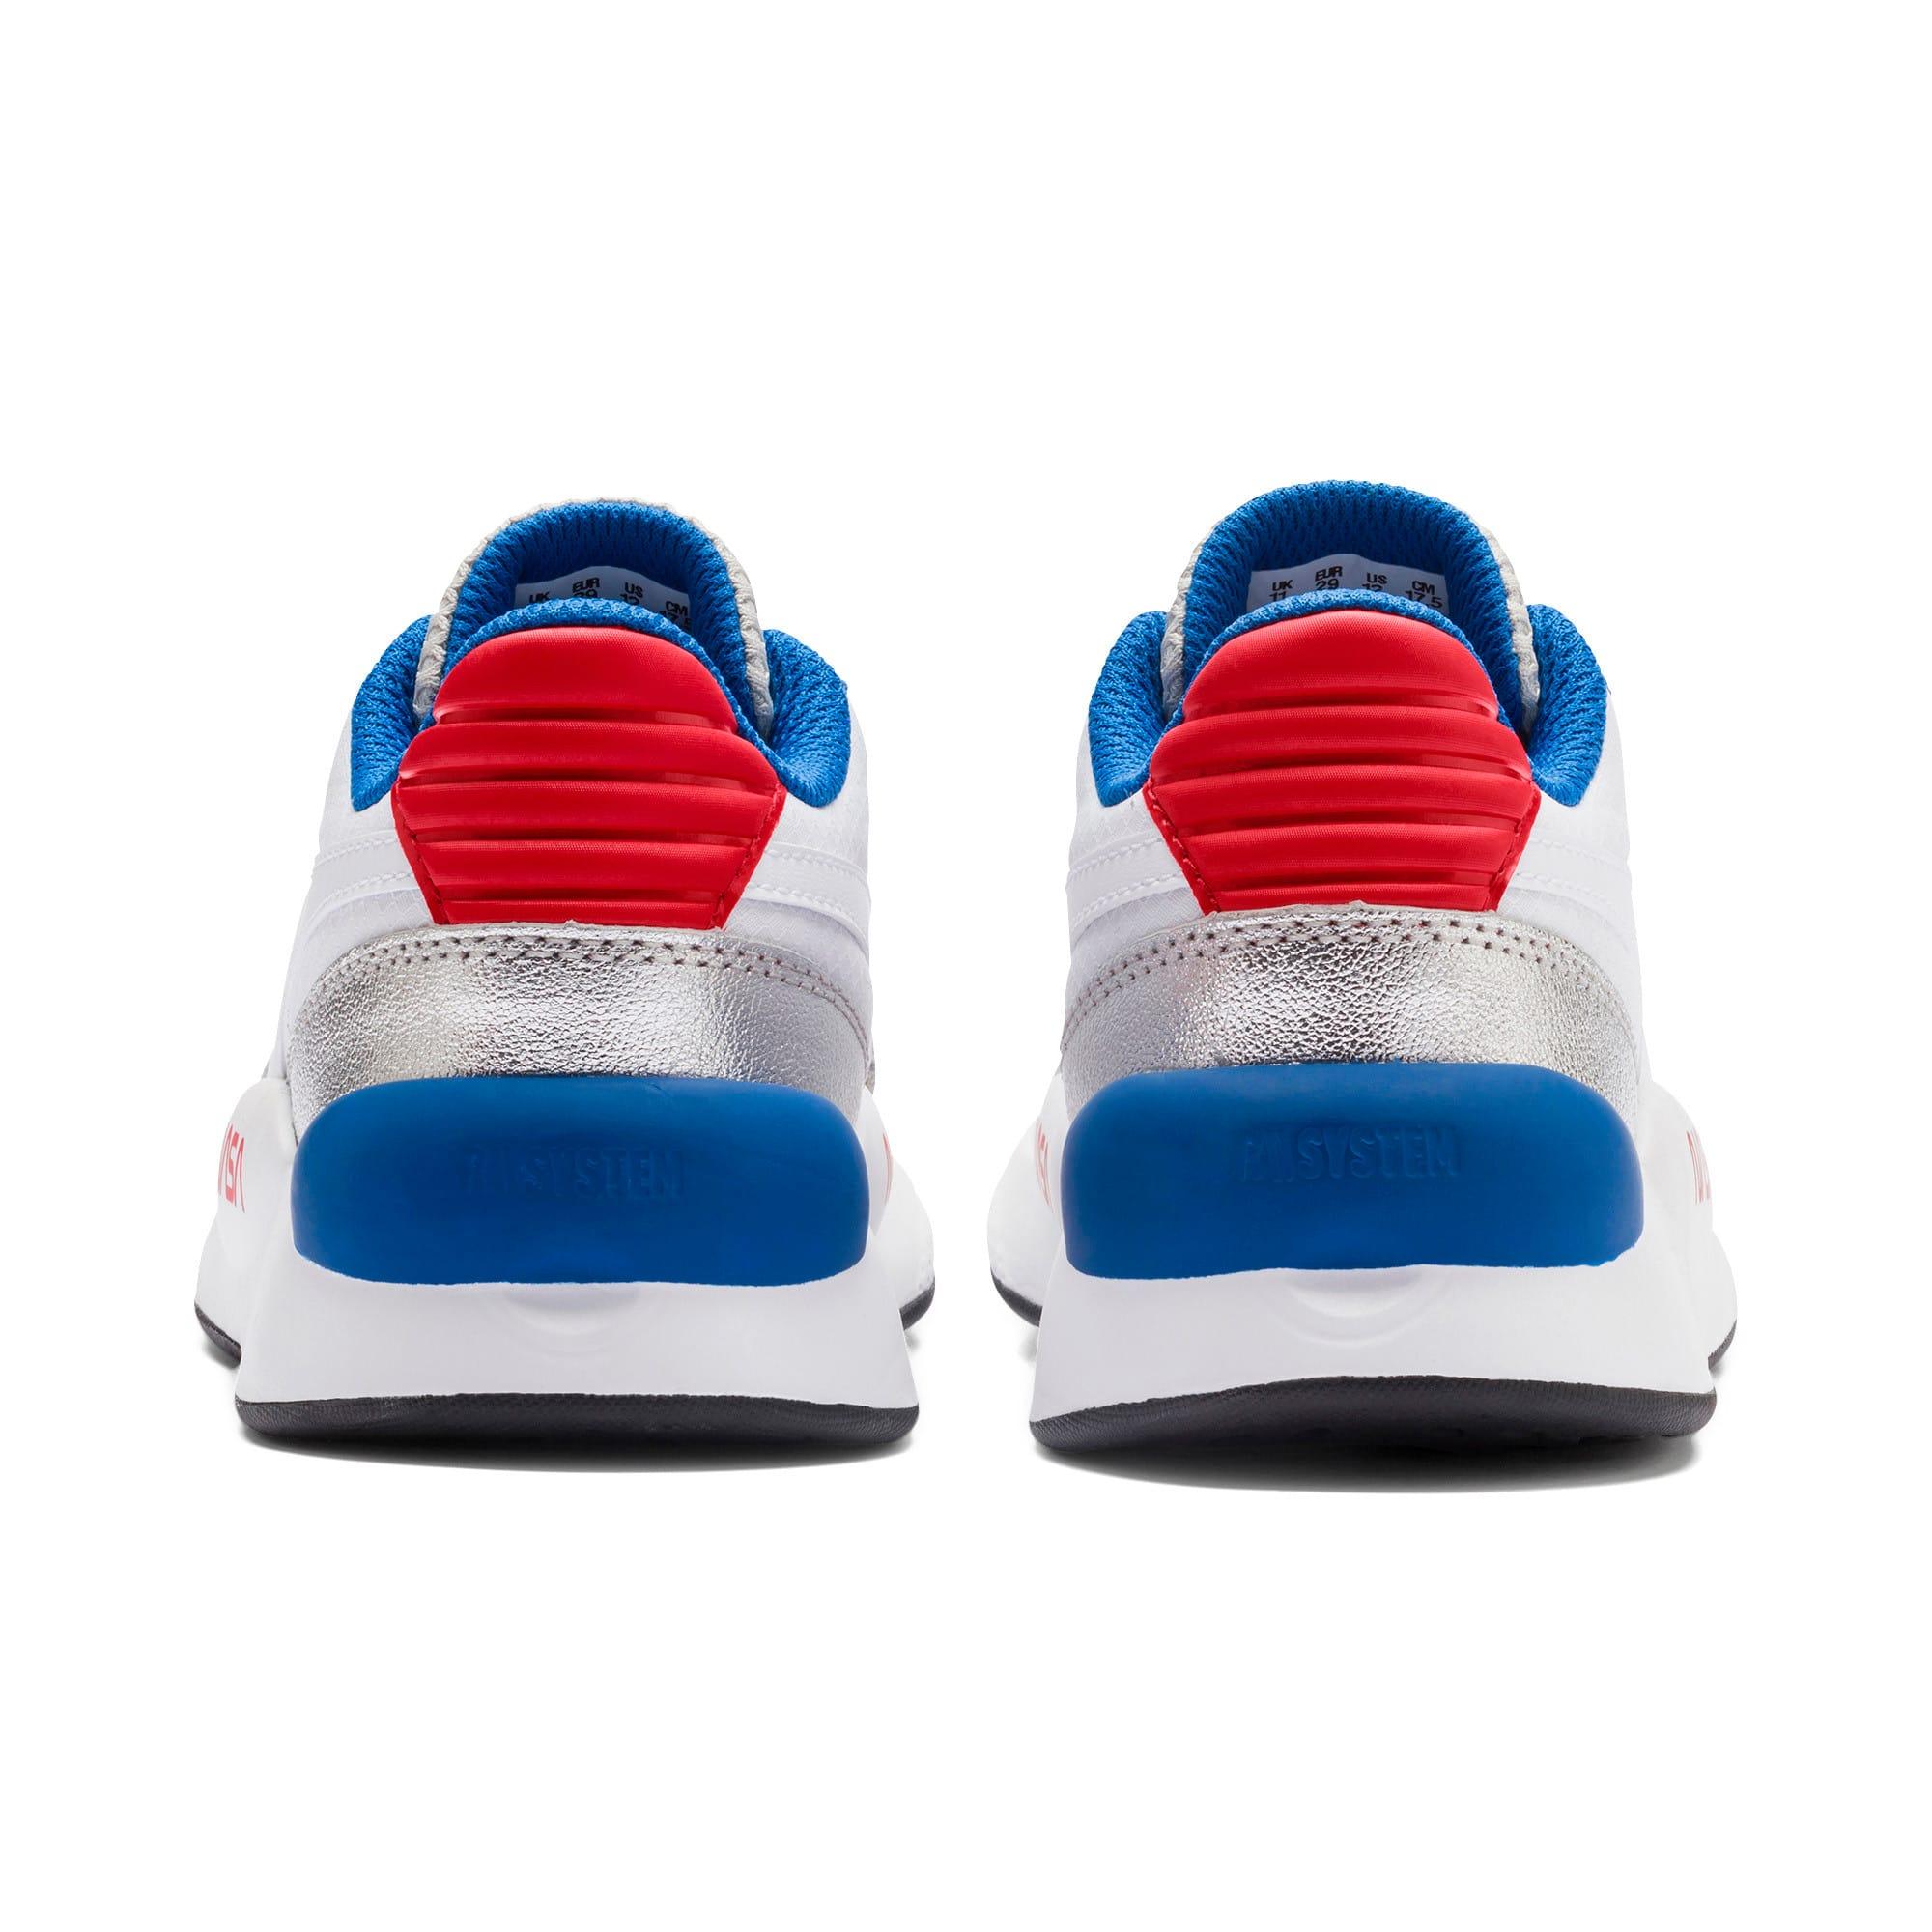 Thumbnail 3 of RS 9.8 Space Agency Little Kids' Shoes, Puma White-Puma Silver, medium